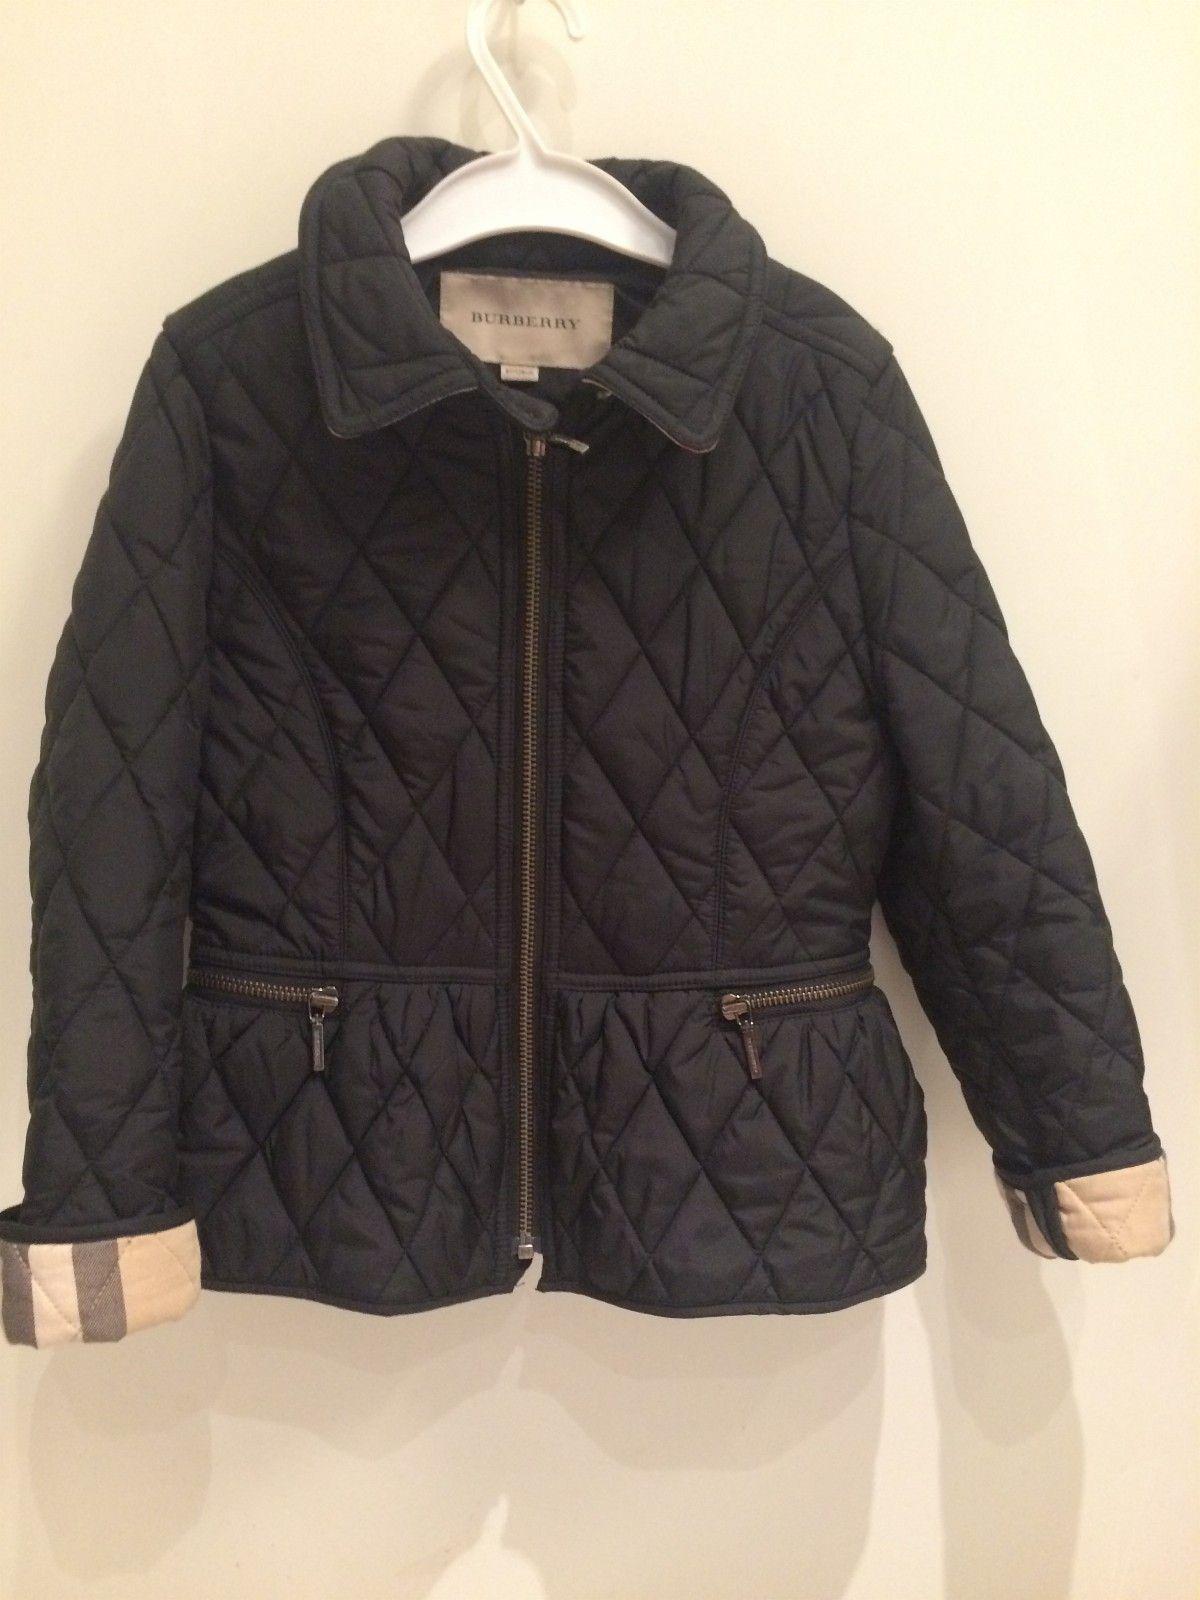 b54c12c6ff8 Burberry quilted no jakke brit FINN 4qr4wHO for rotterdam.web ...